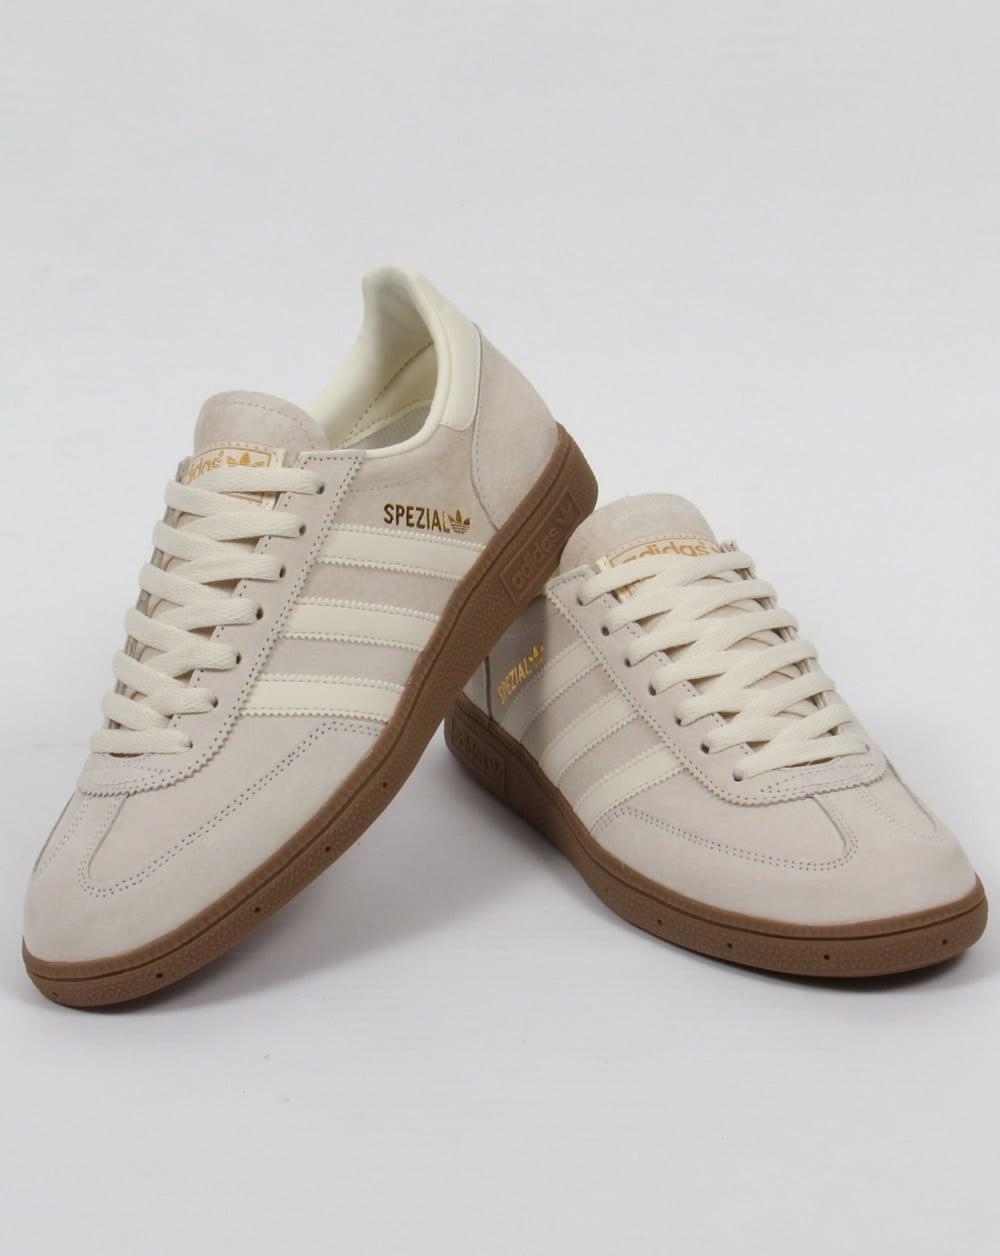 adidas spzl trainers for men